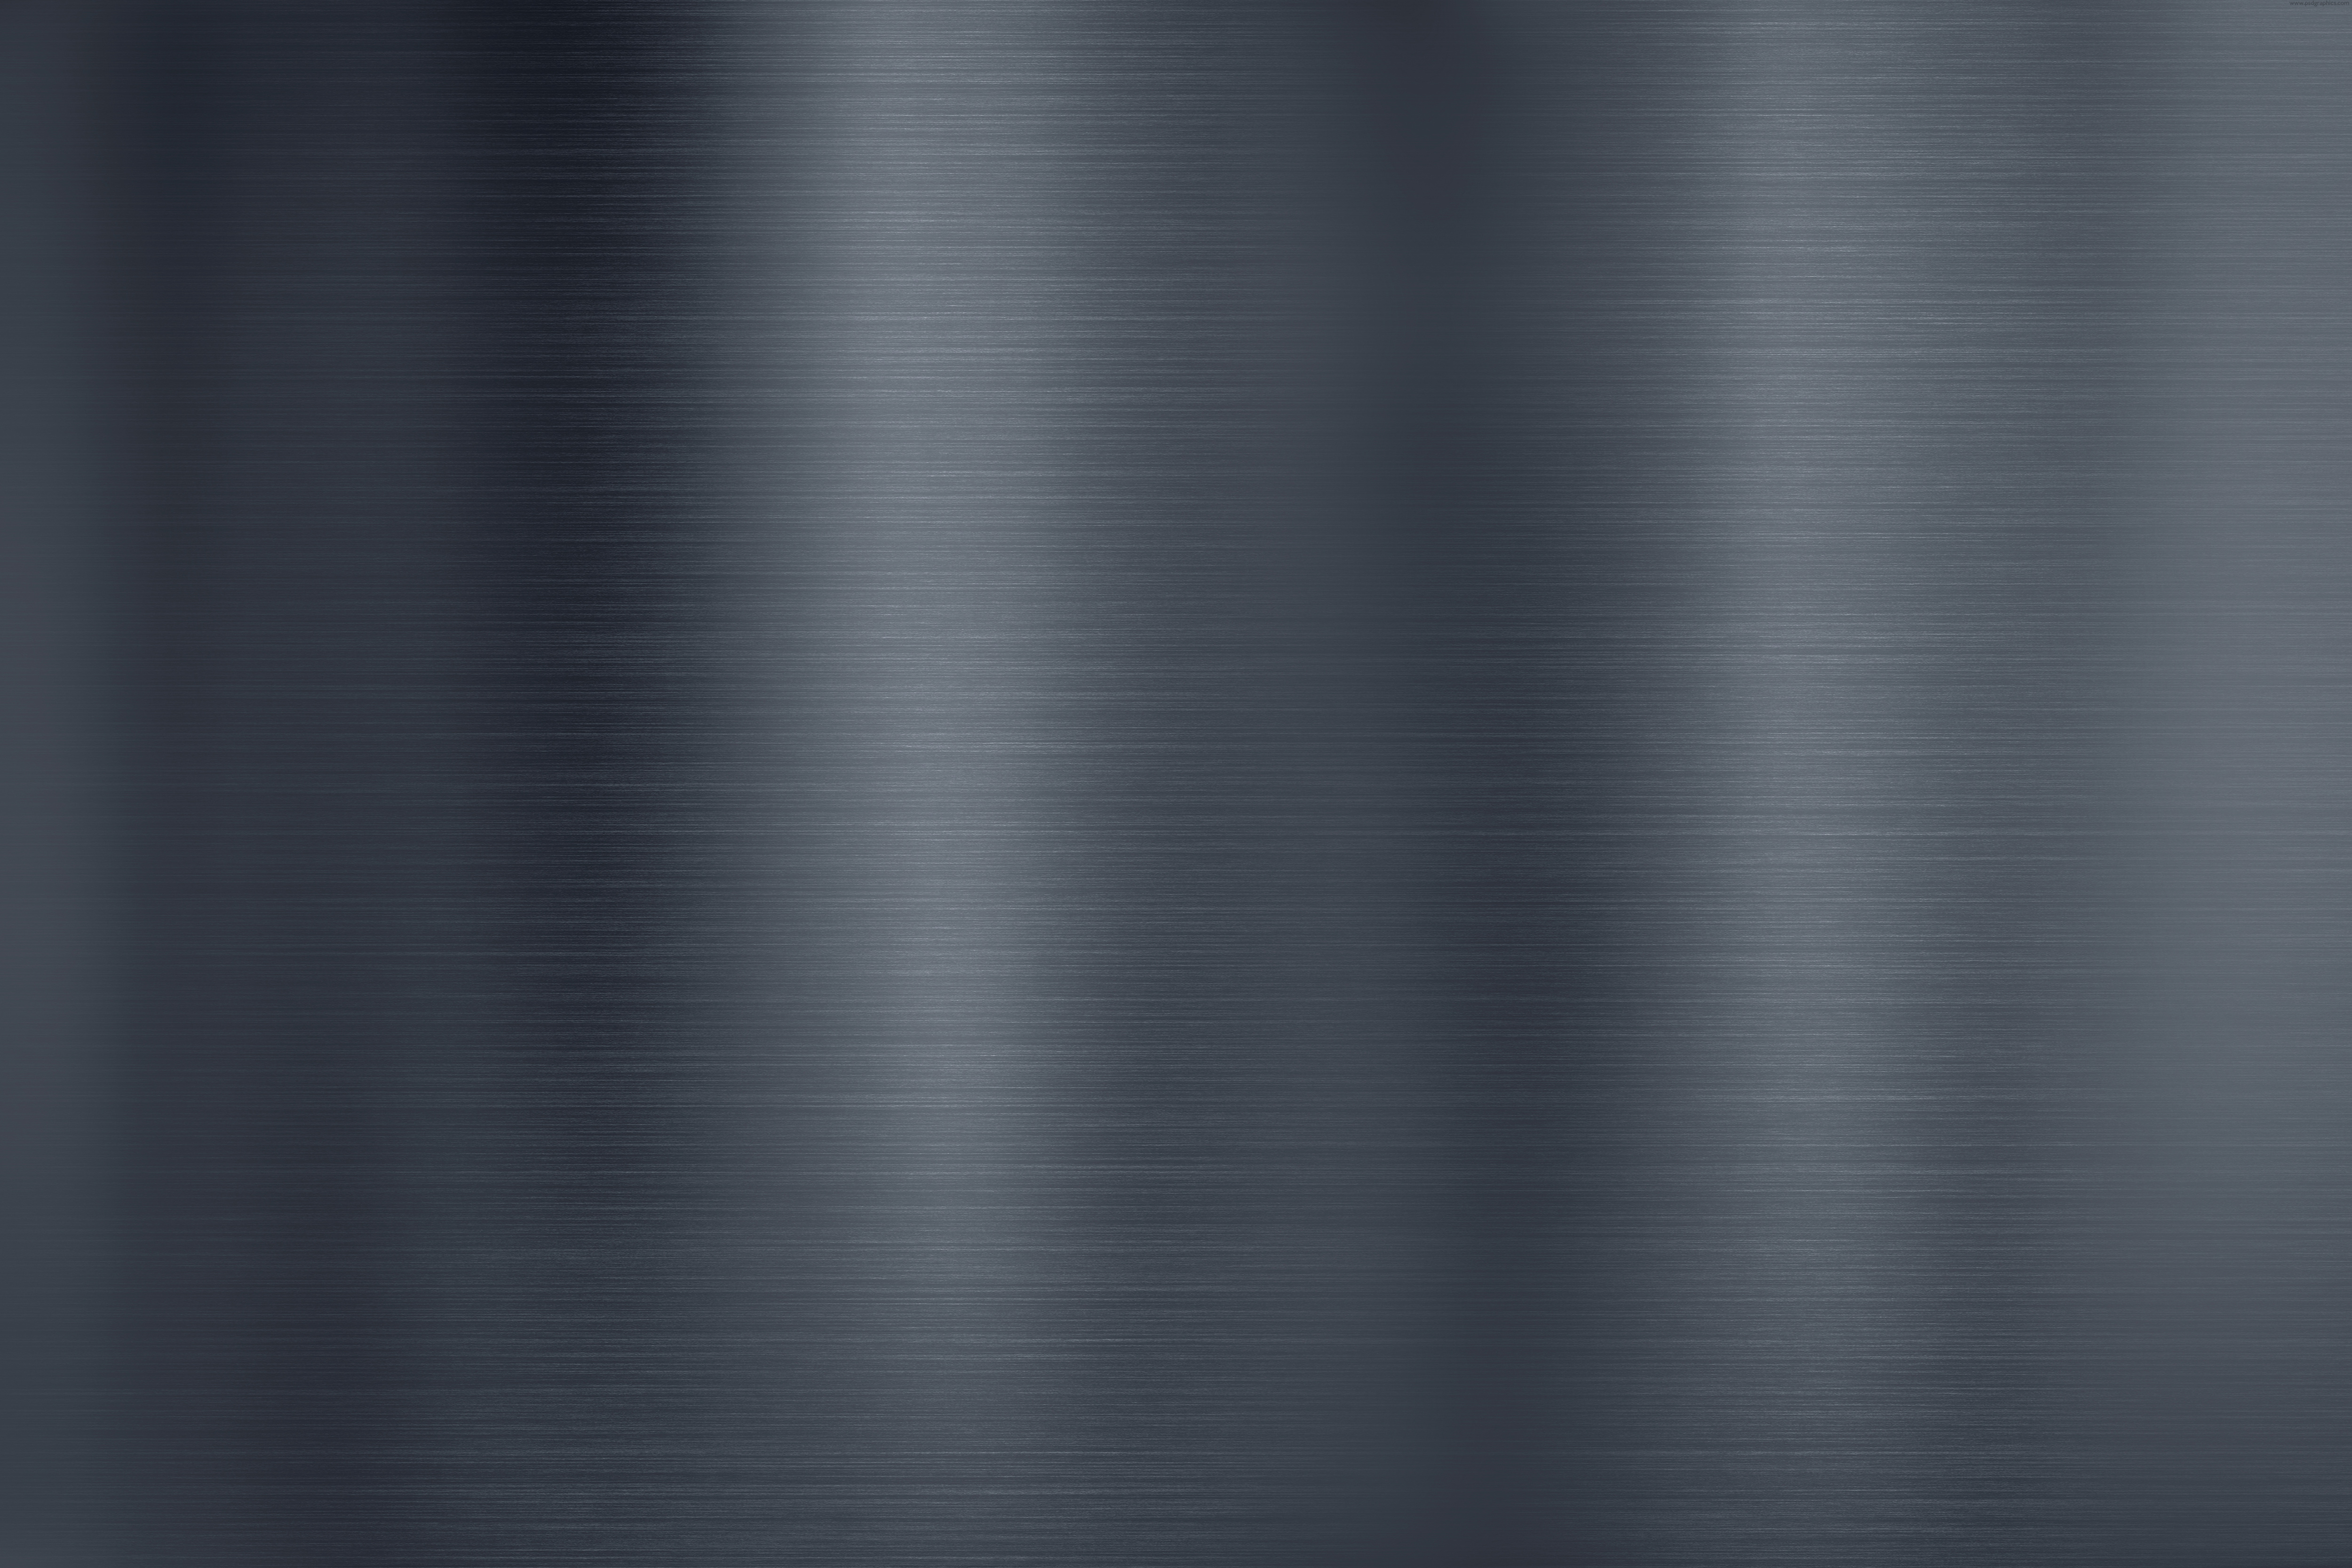 Magnesium Metal Texture Psdgraphics